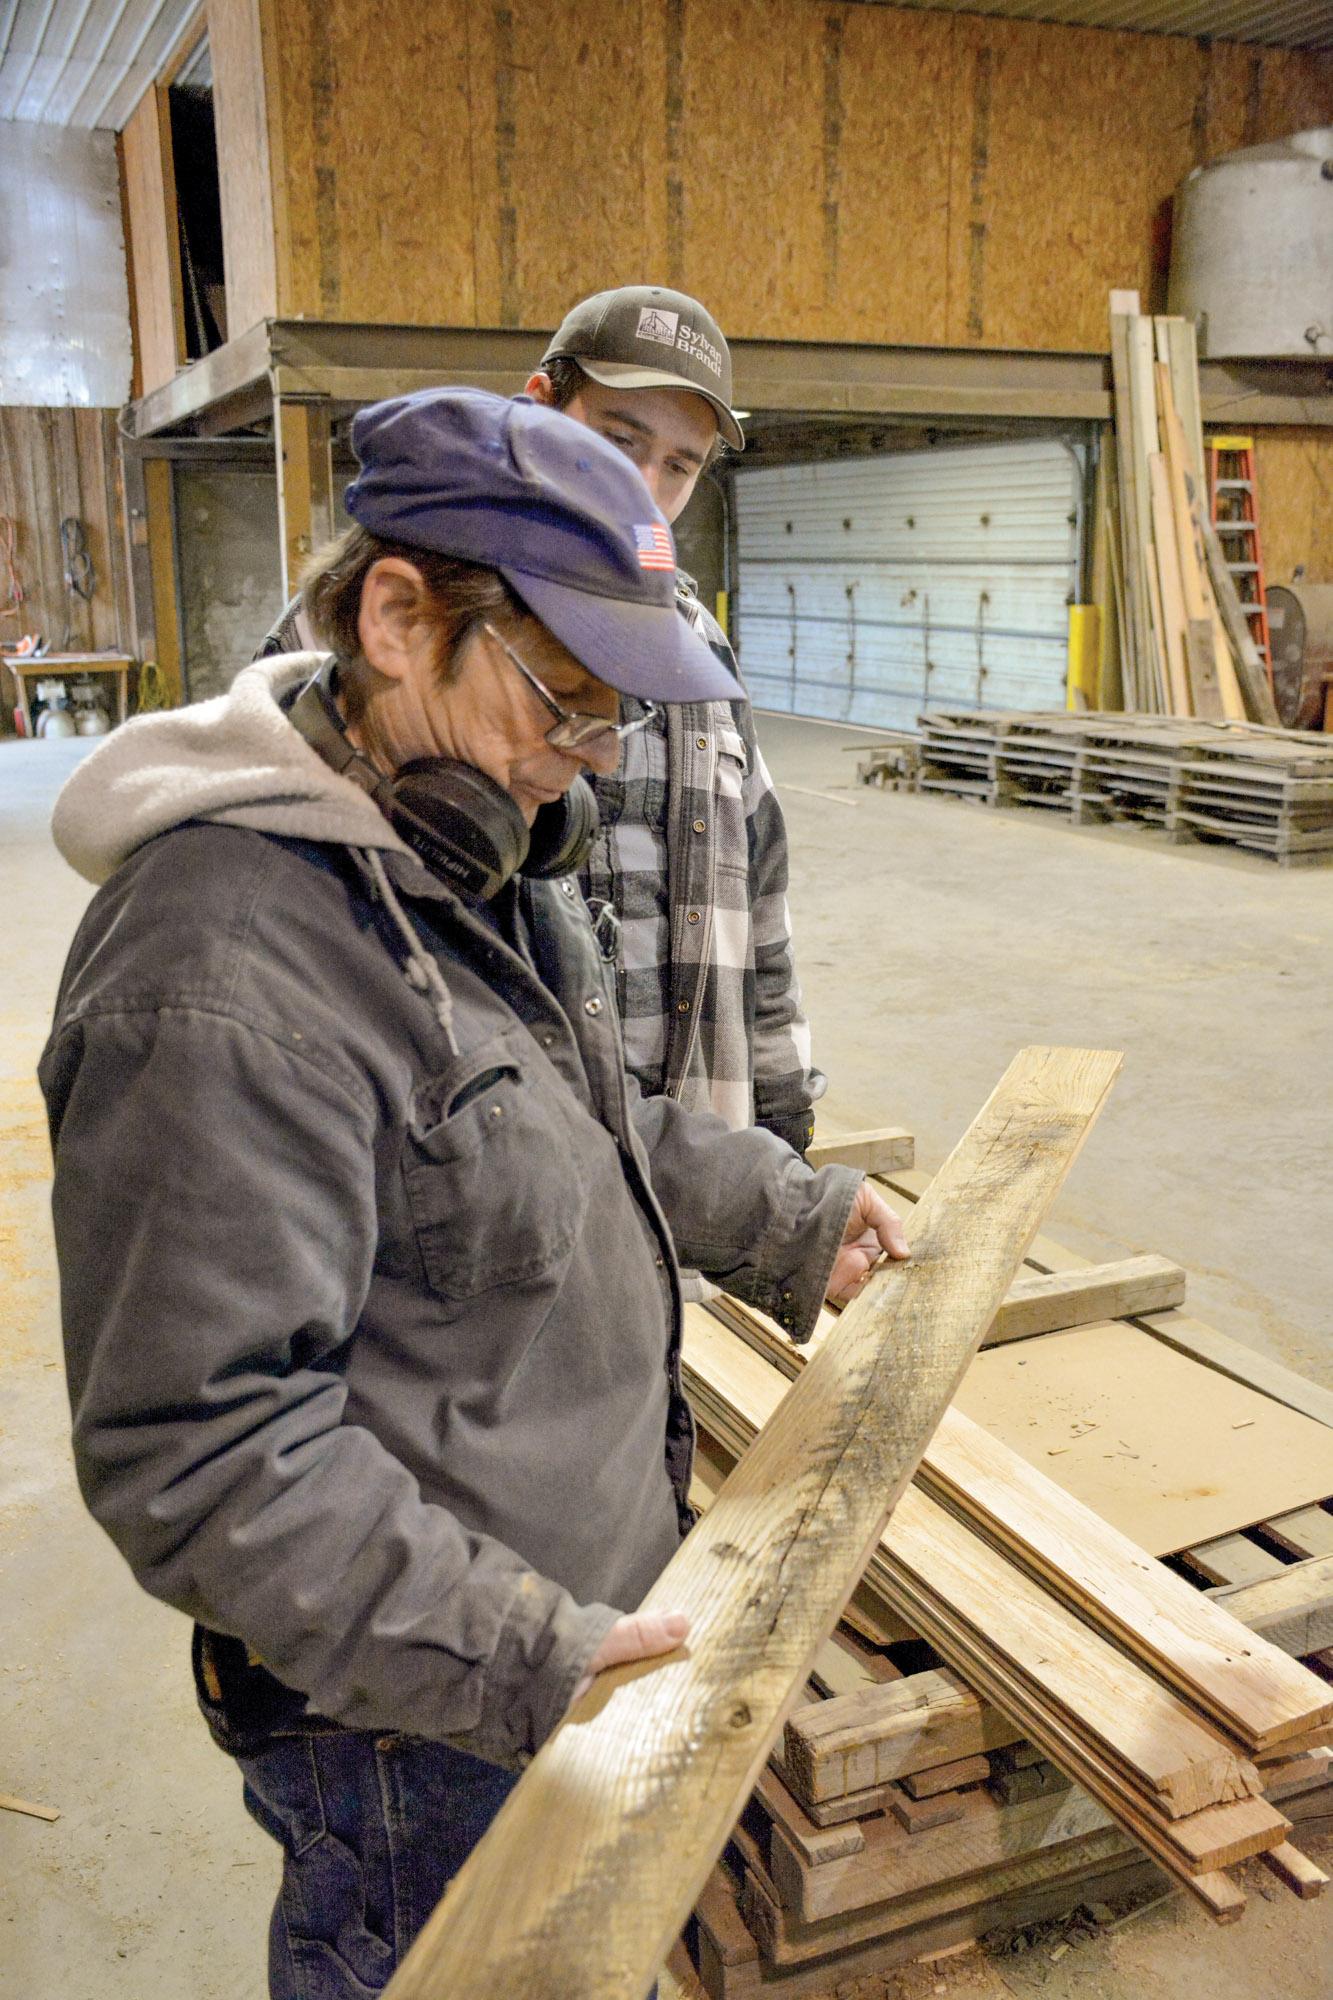 Dean Brandt and associate Robert Walton examine a floorboard before shipment.